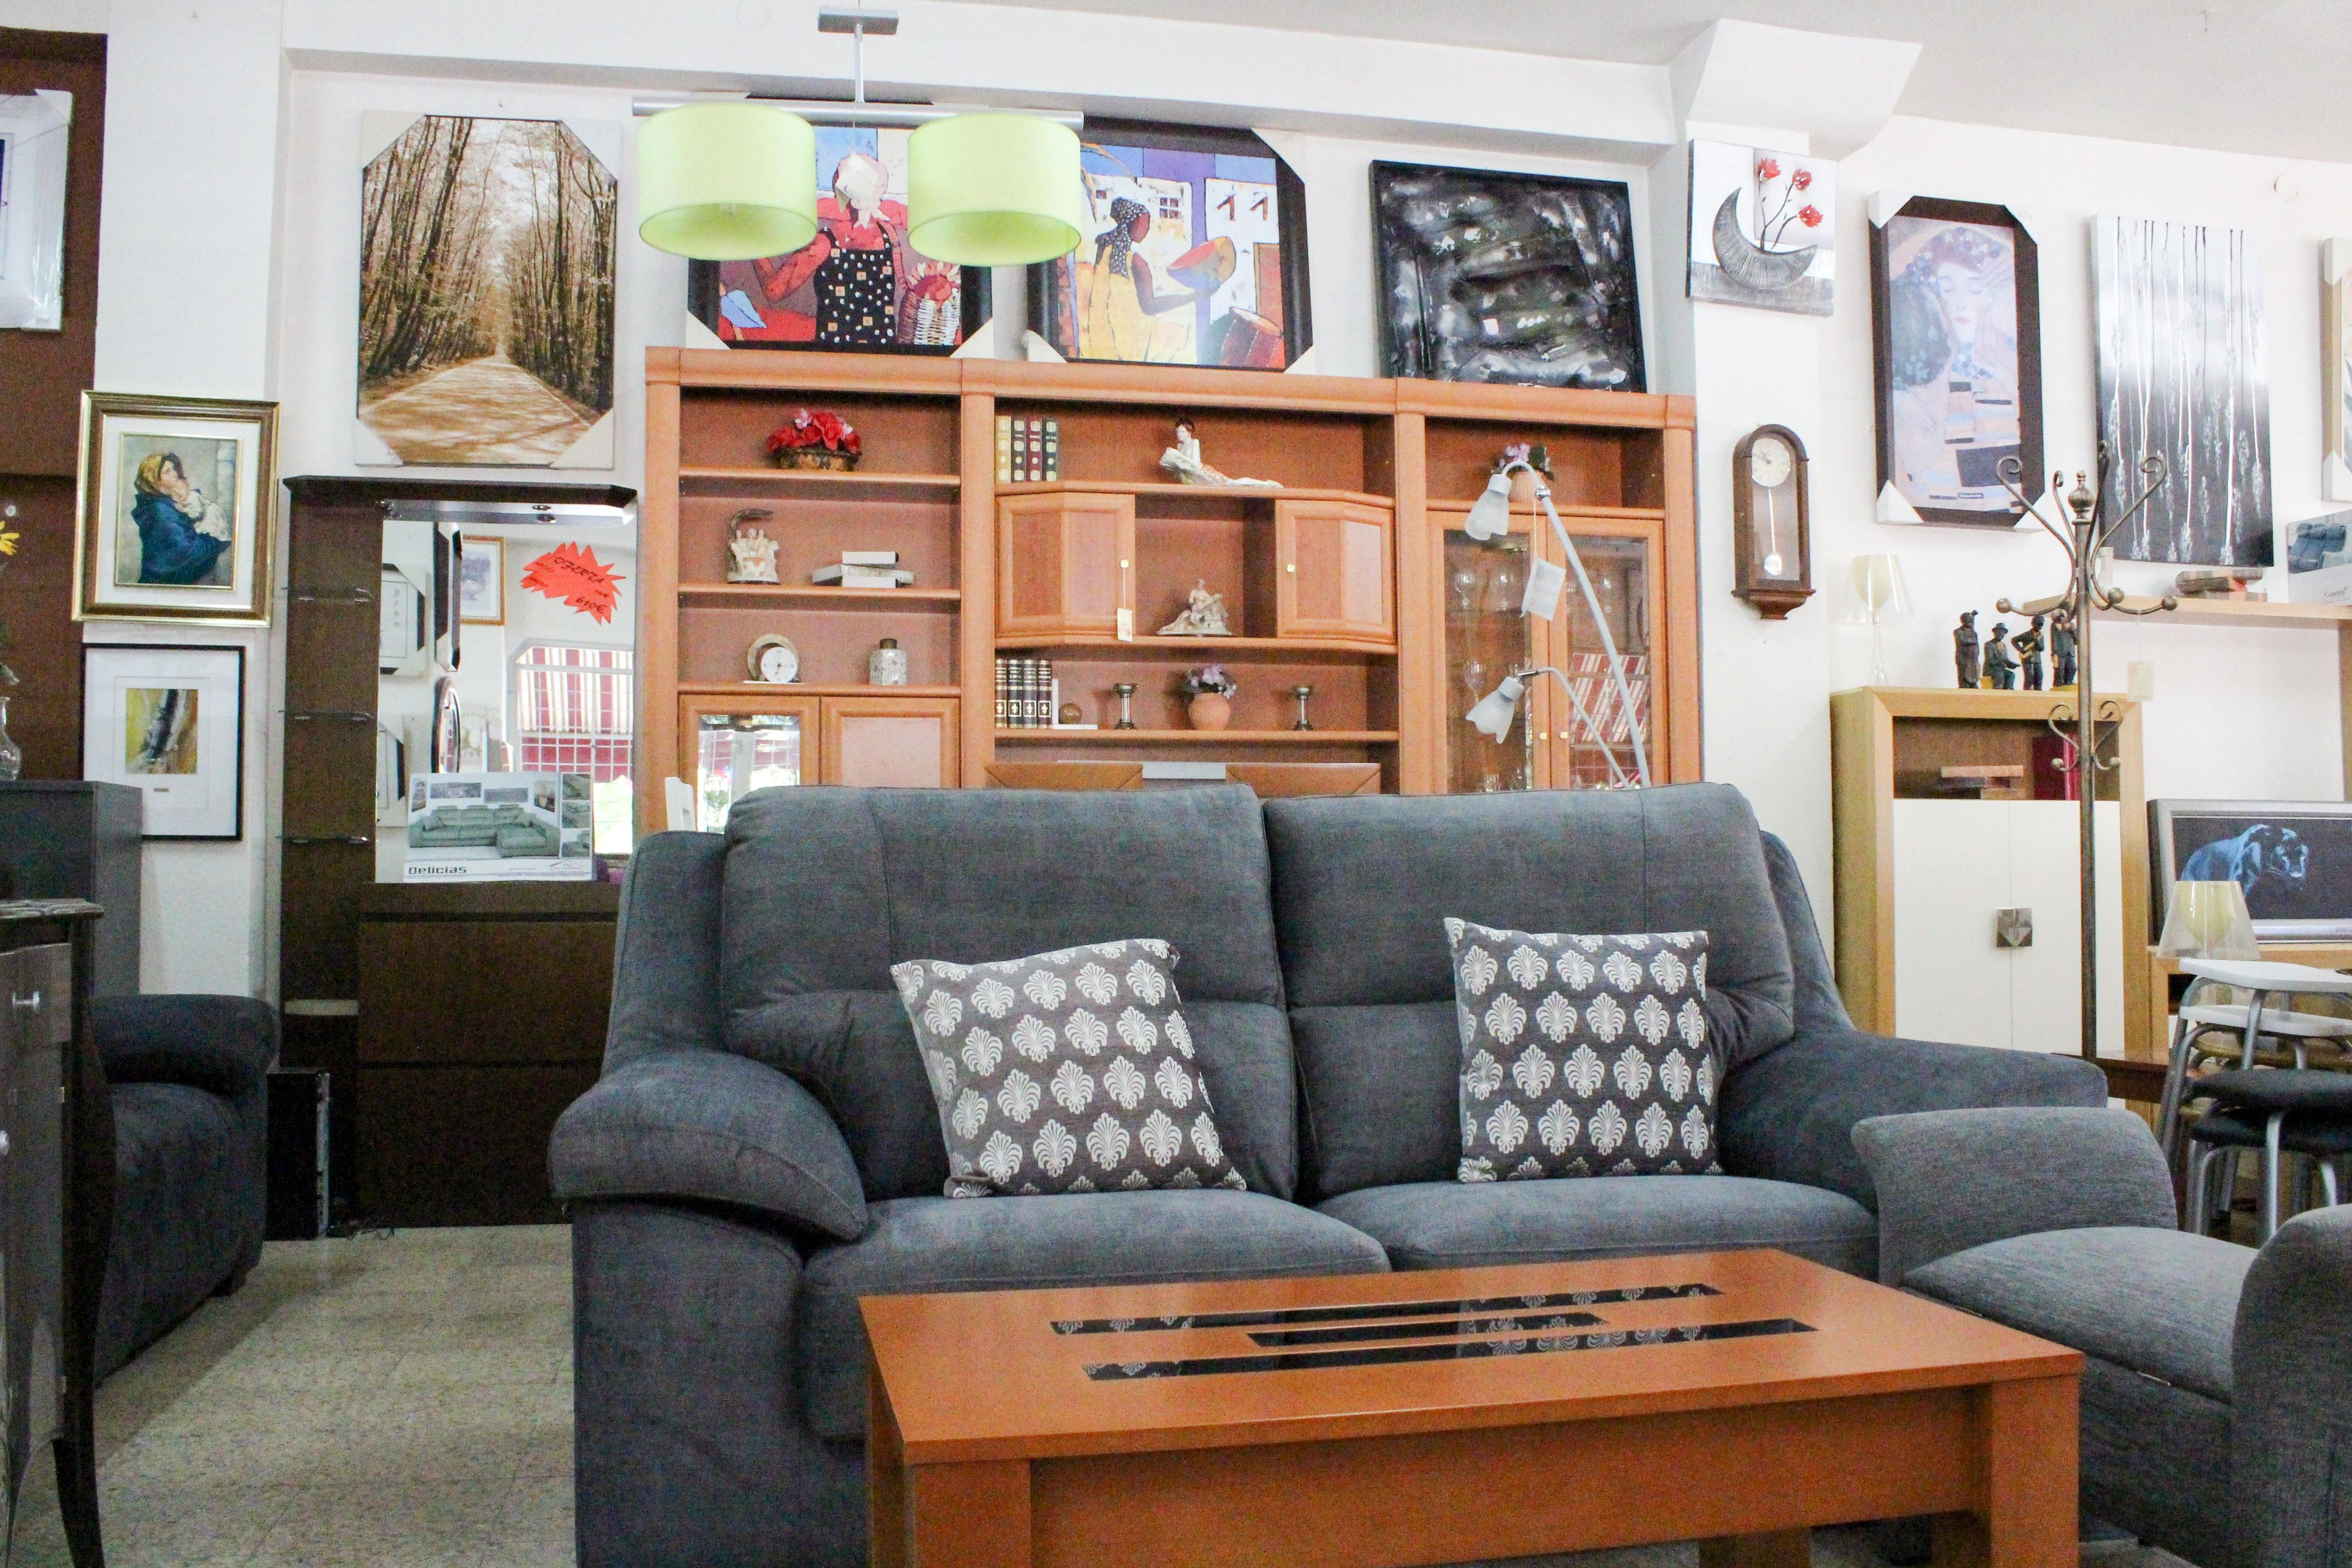 Foto 1 de Muebles en Móstoles | Muebles Los Ángeles